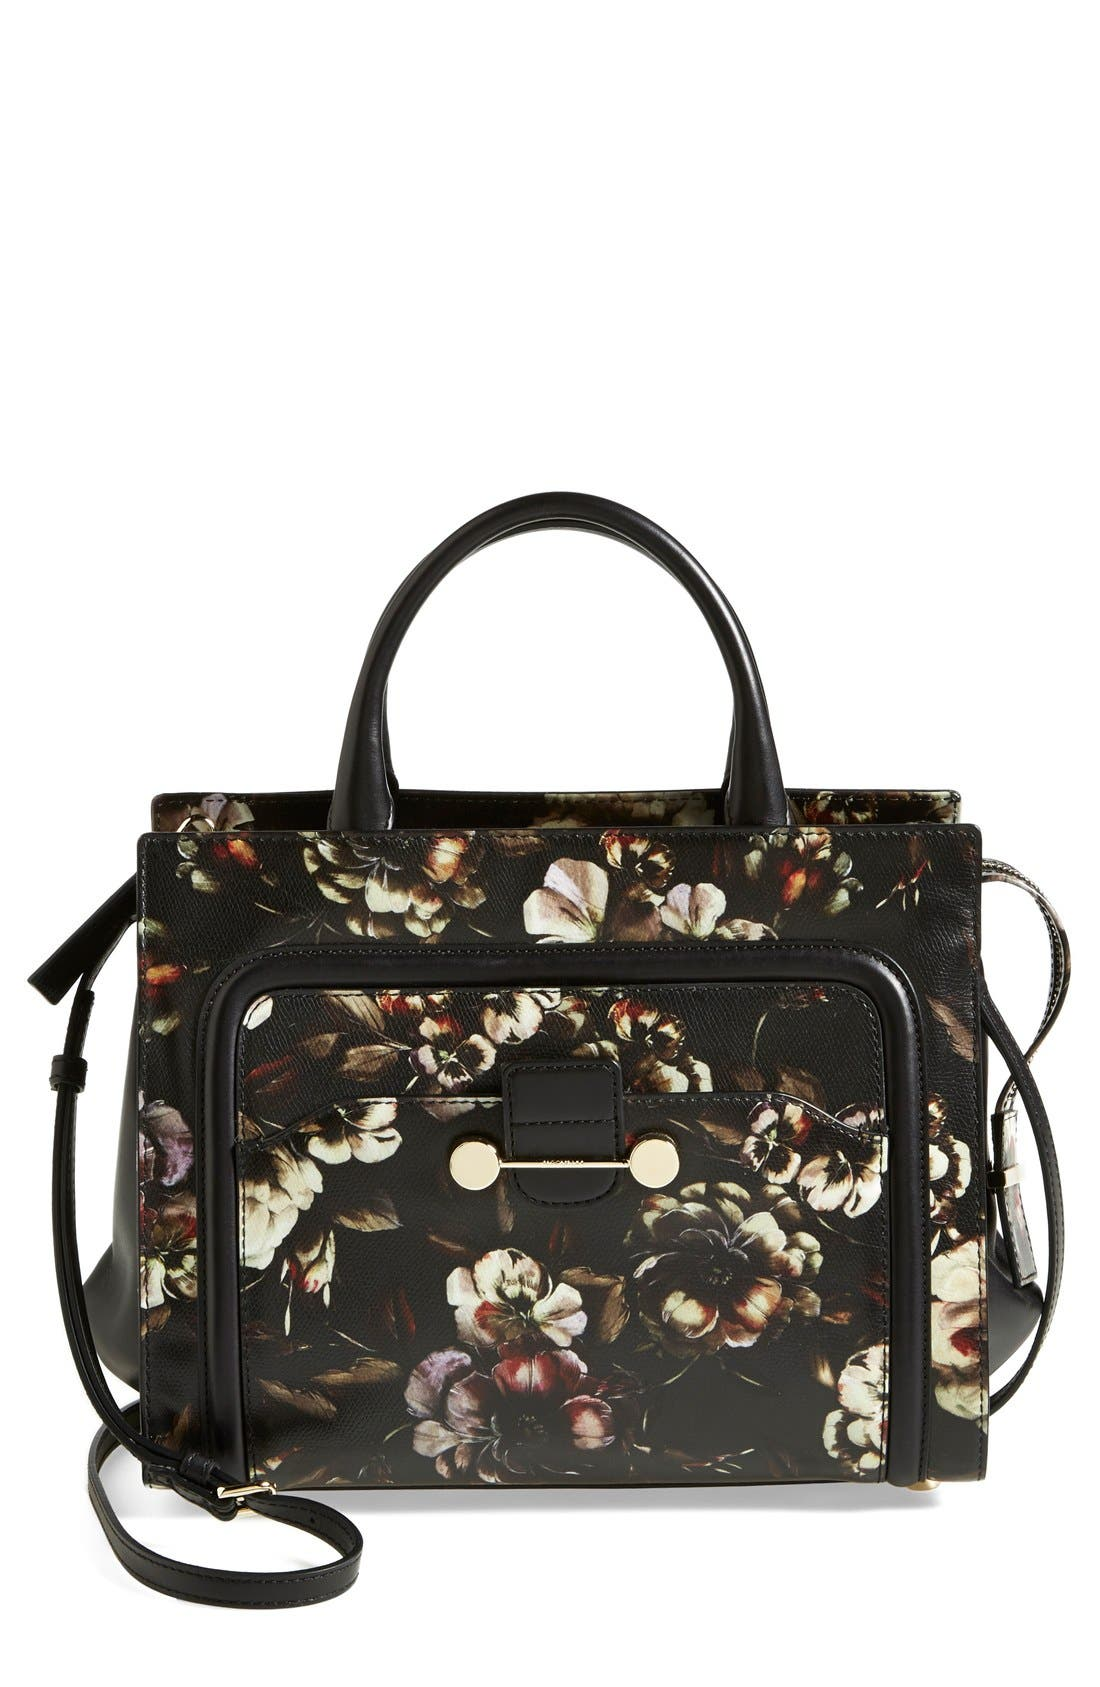 Jason Wu U0026#39;Daphneu0026#39; Floral Print Crossbody Bag | Nordstrom